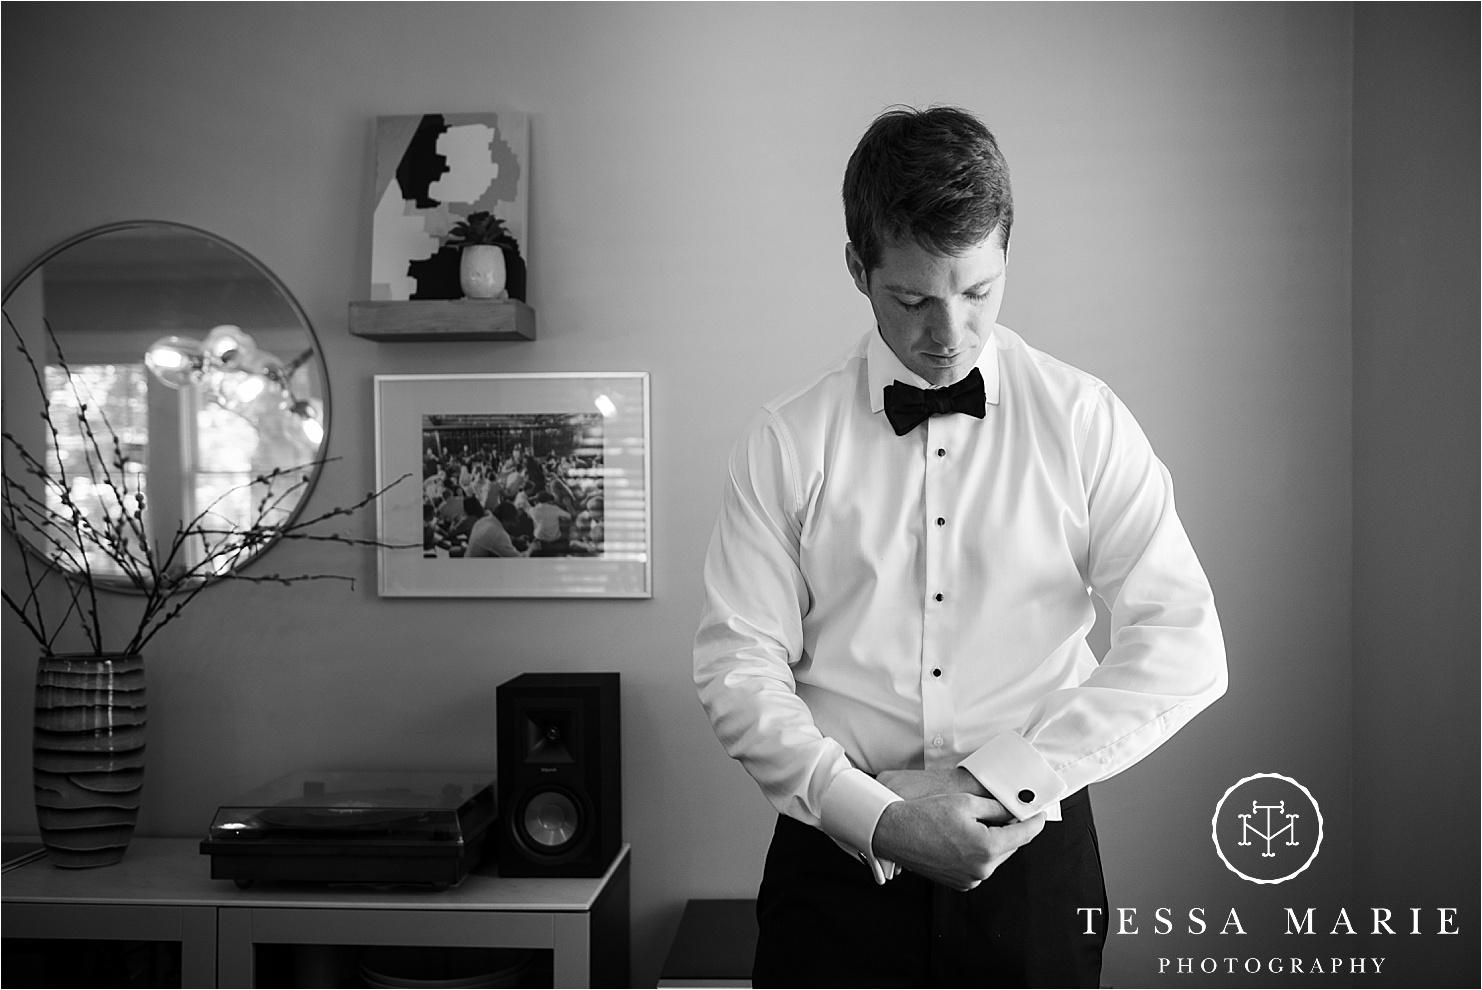 Tessa_marie_weddings_houston_wedding_photographer_The_astorian_0035.jpg